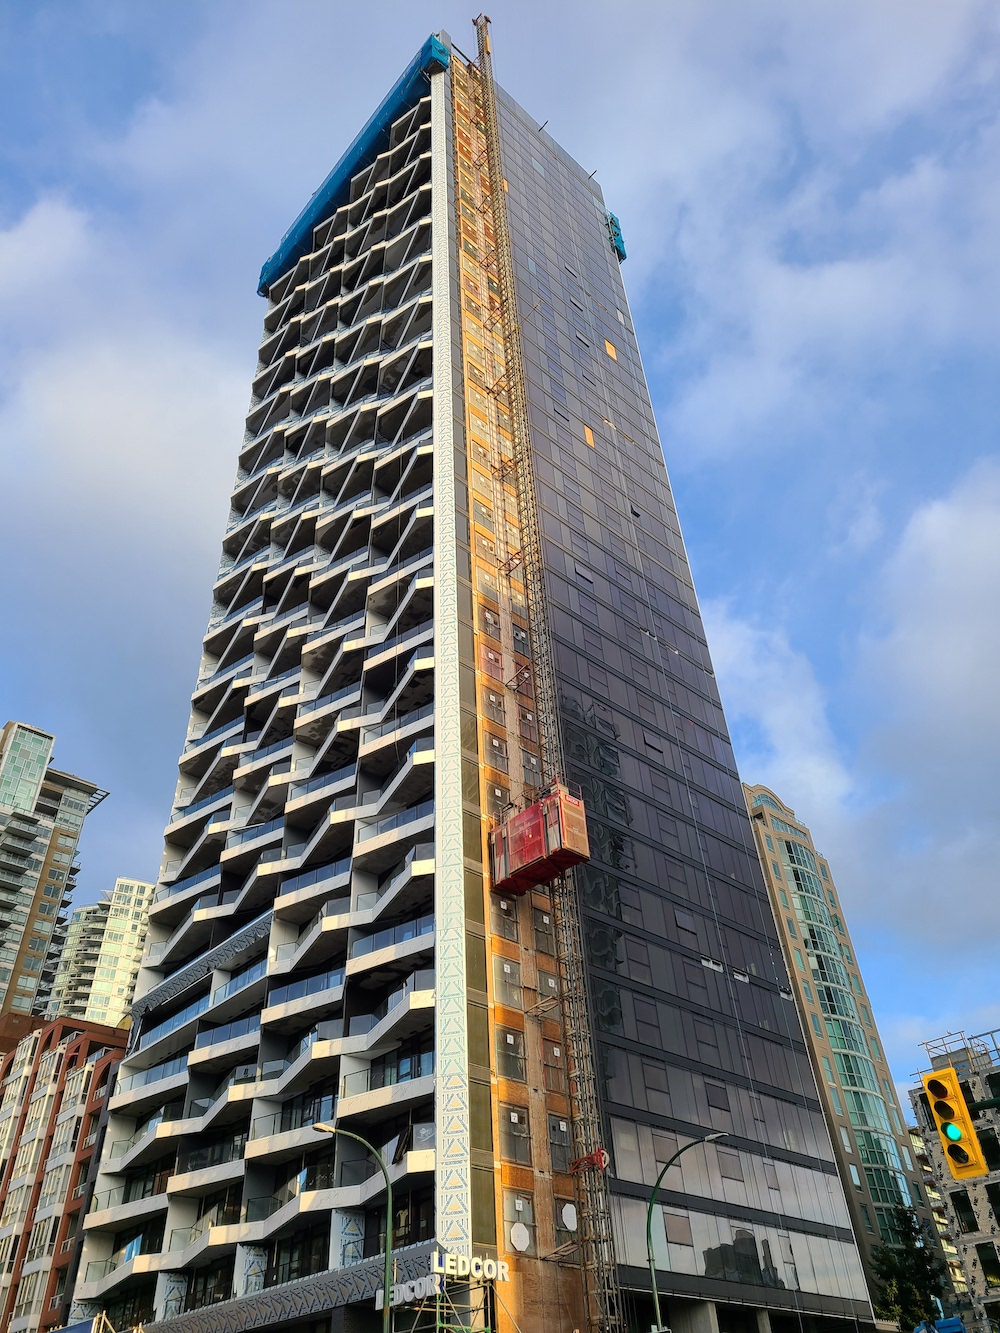 the pacific construction grosvenor americas january 23 2021